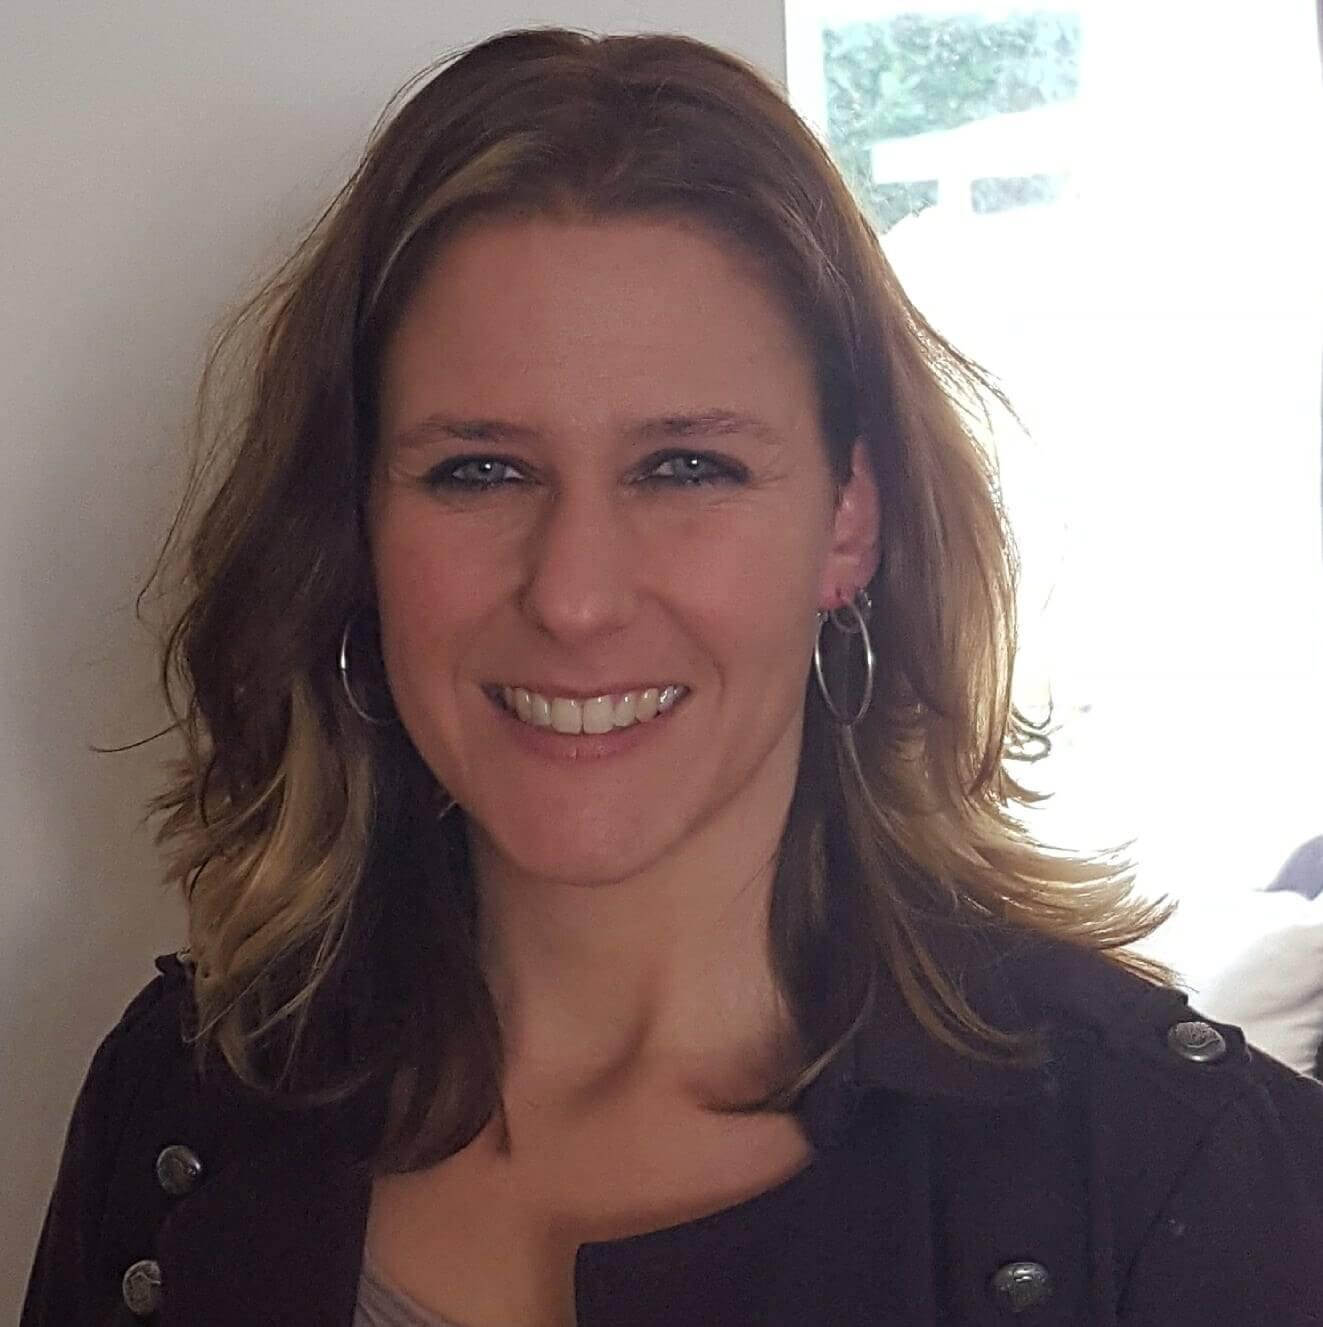 Joëlla Heemskerk